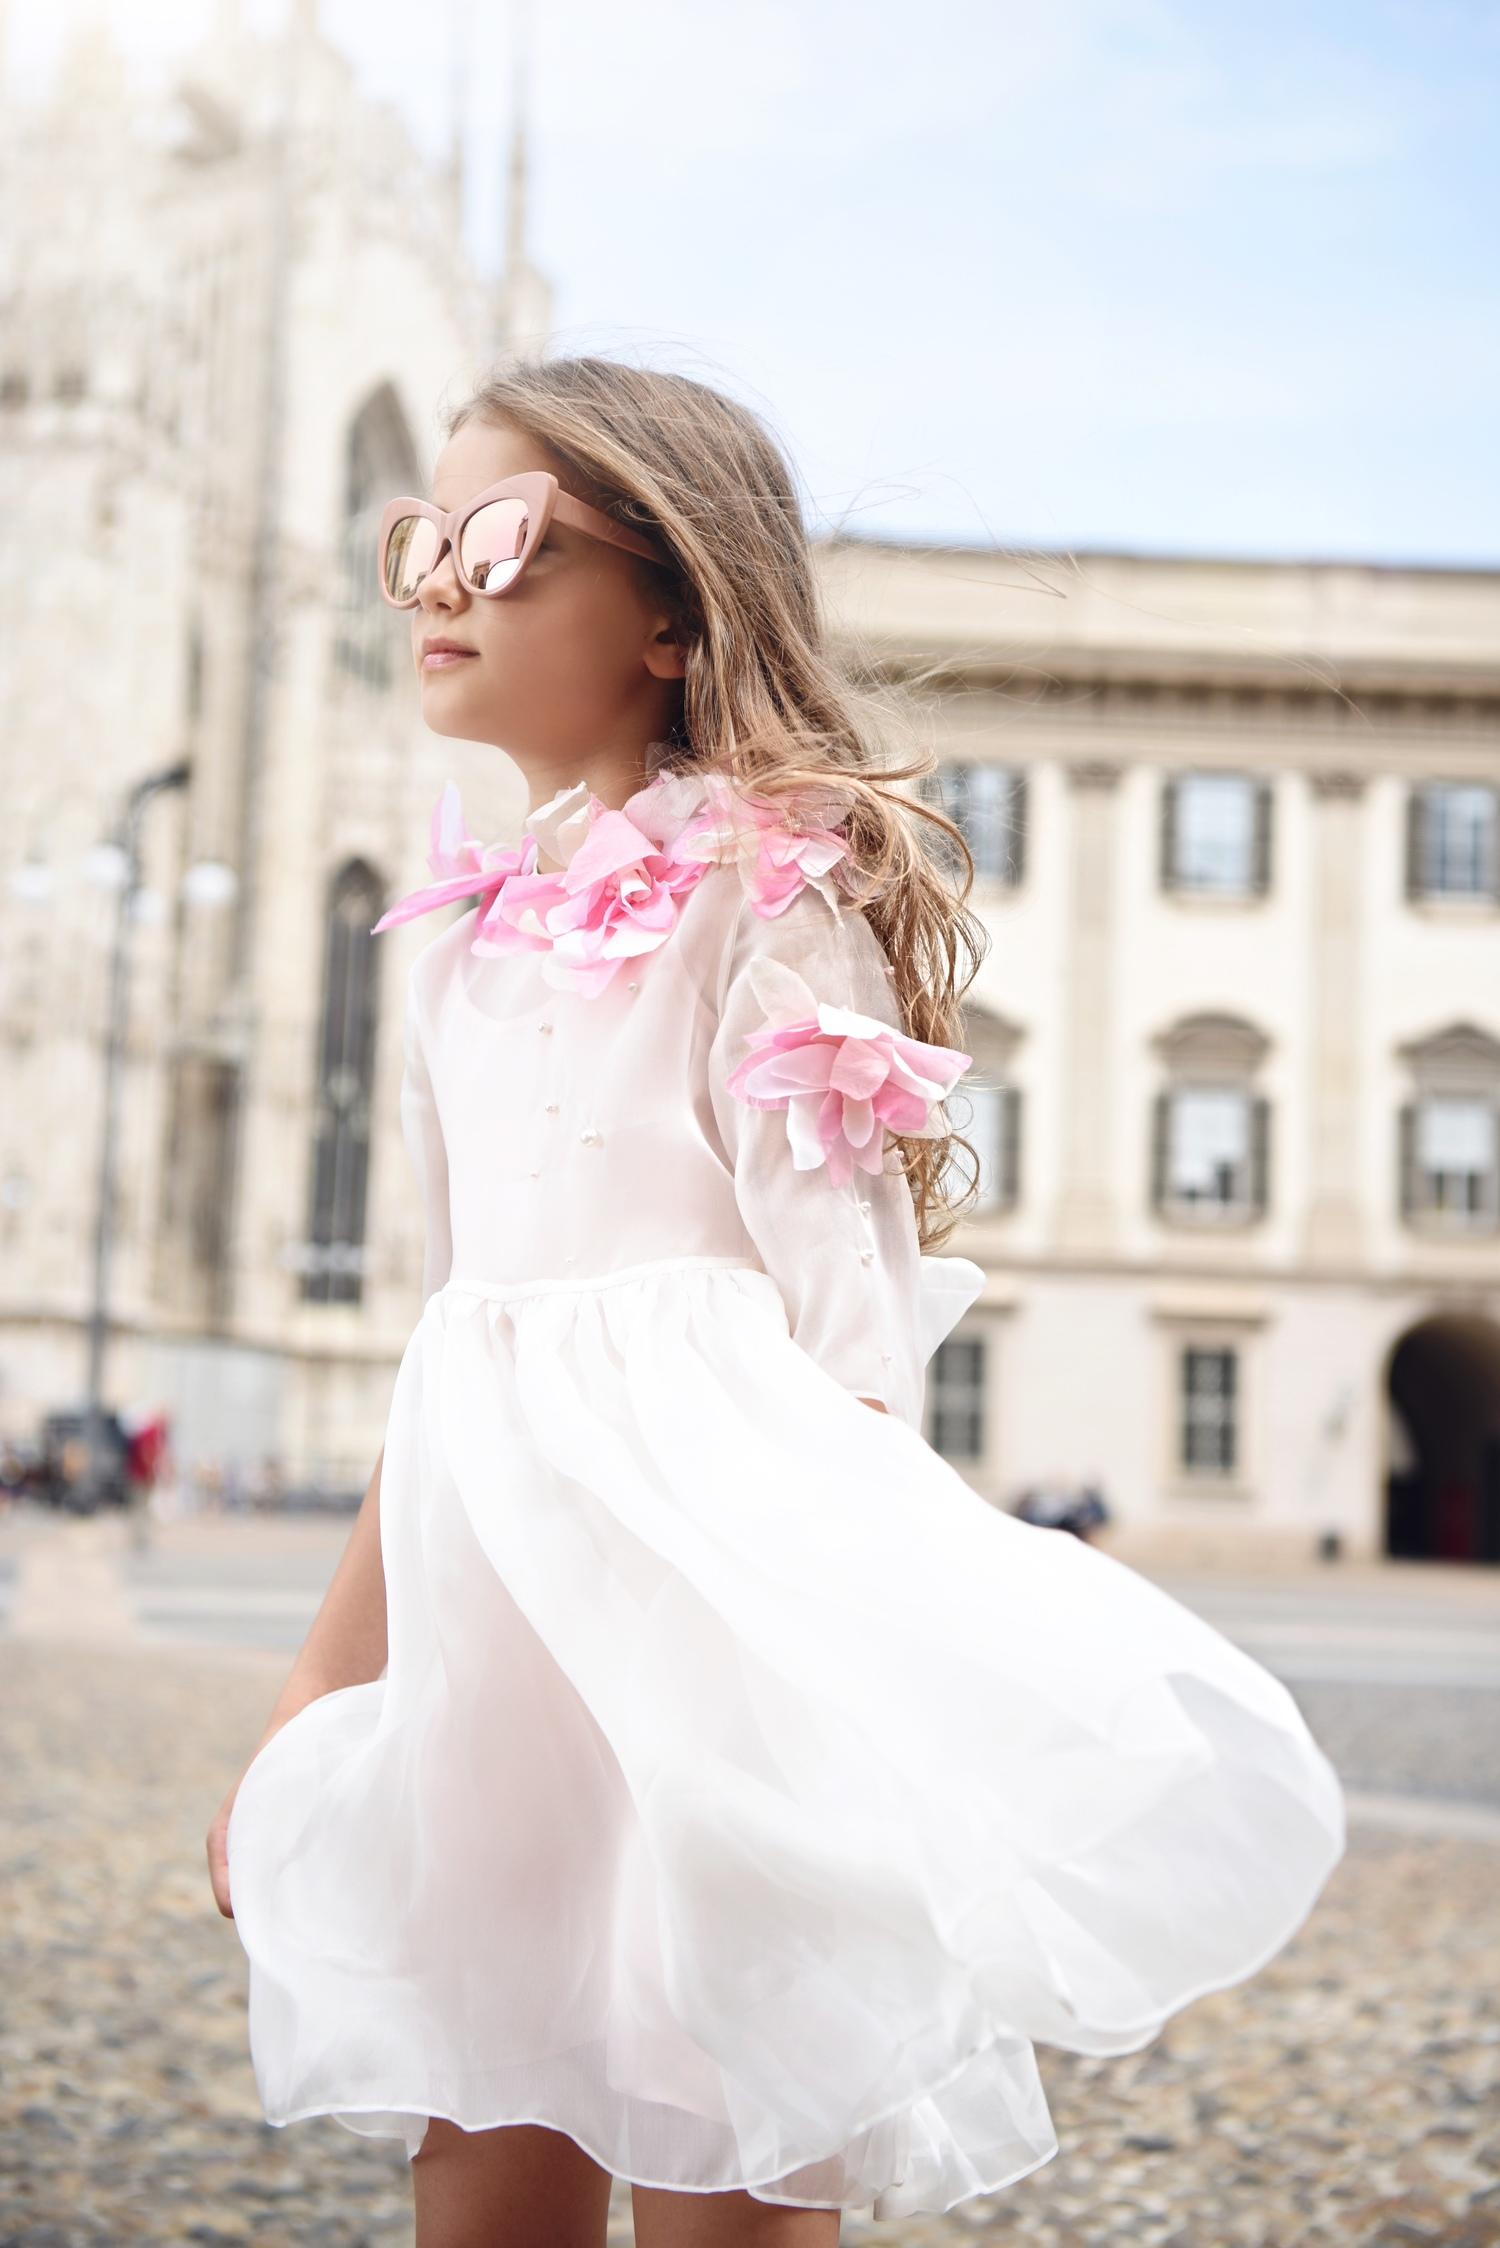 Enfant+Street+Style+by+Gina+Kim+Photography-3.jpeg